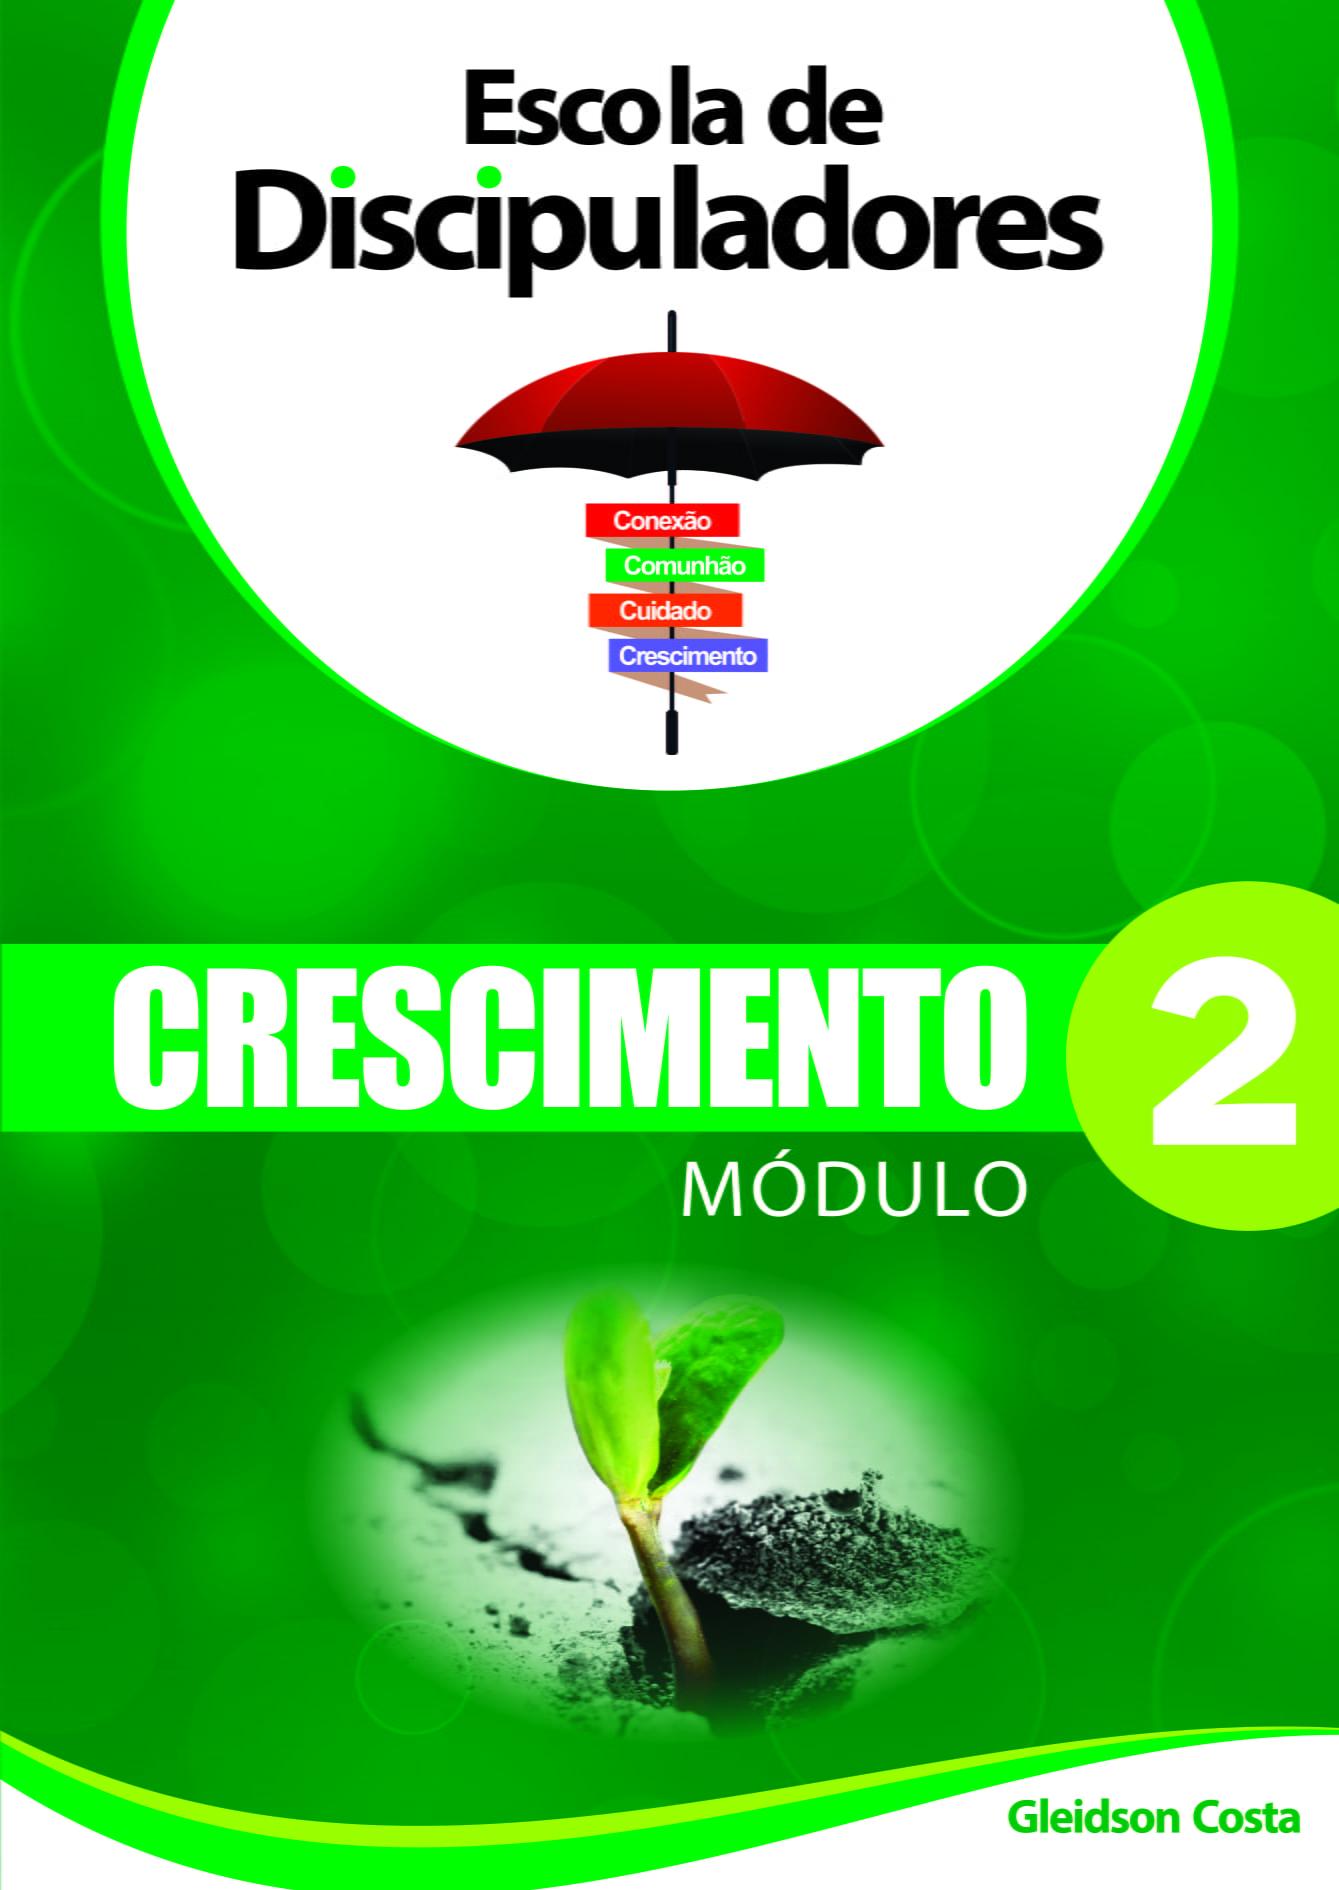 ***ESCOLA DE DISCIPULADORES CRESCIMENTO MOD. 2